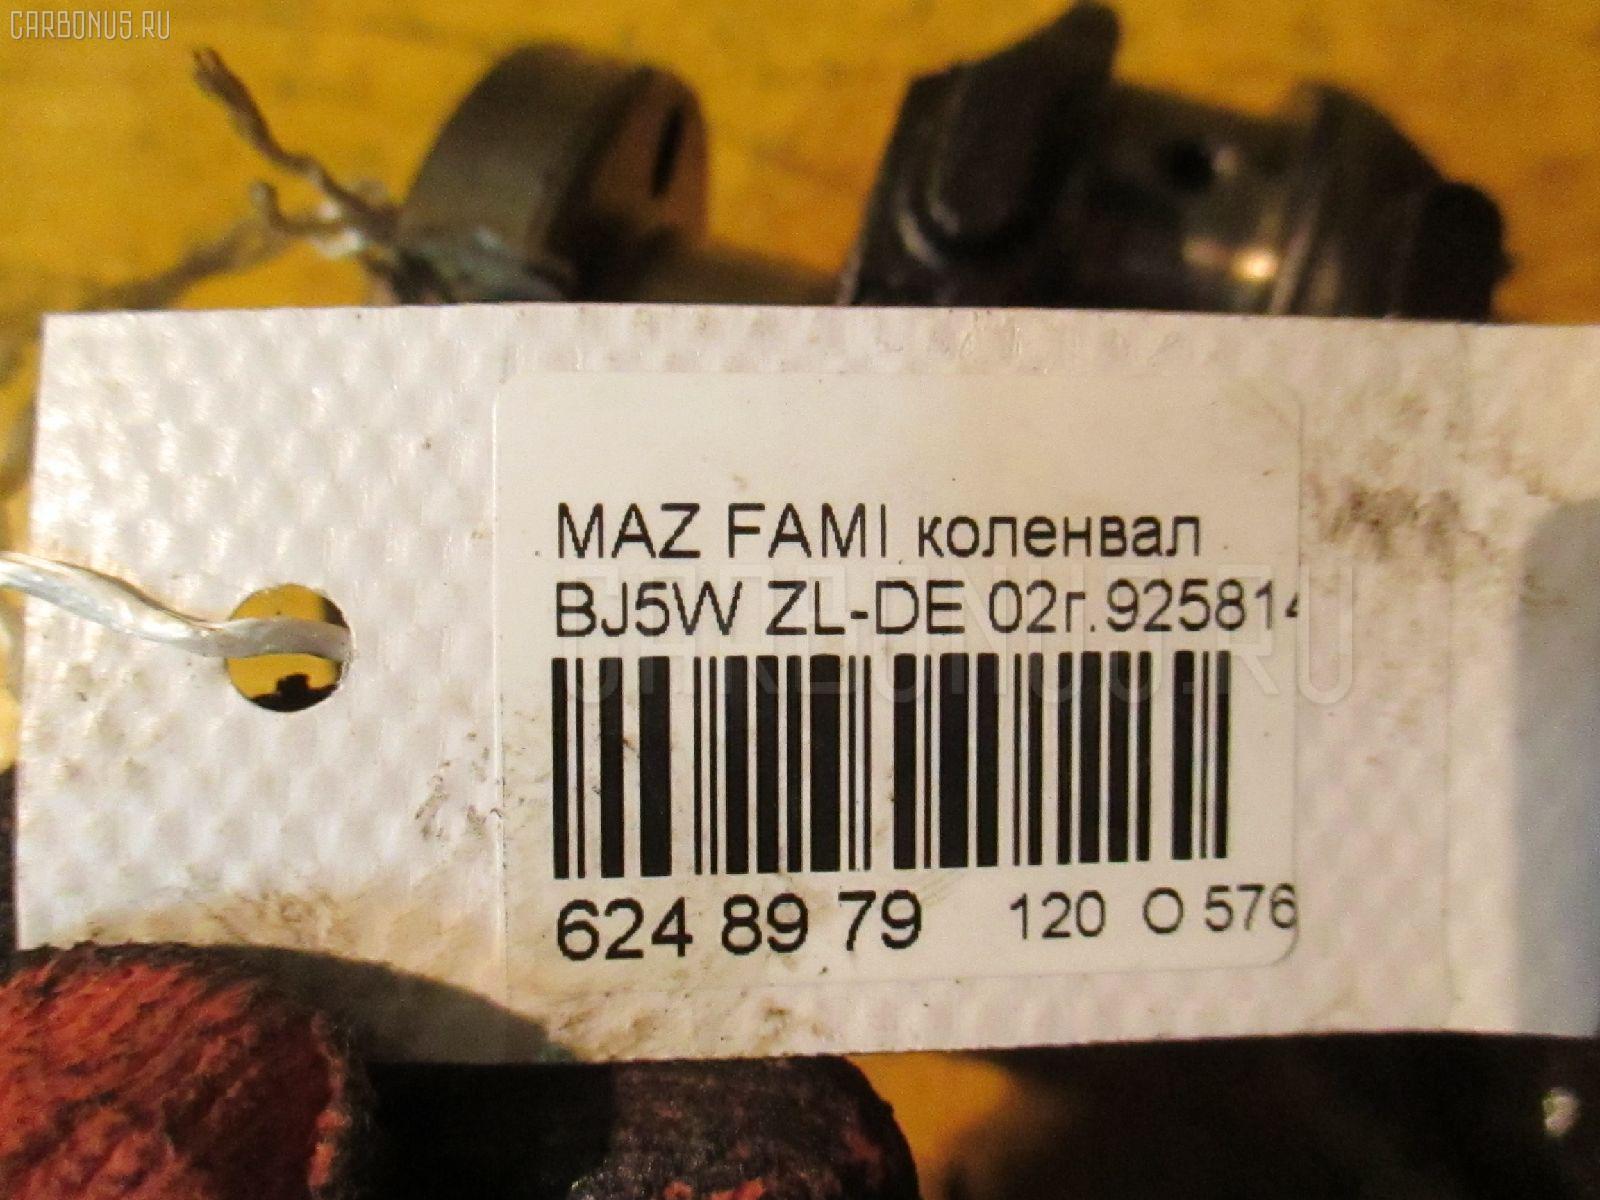 Коленвал MAZDA FAMILIA S-WAGON BJ5W ZL-DE Фото 4